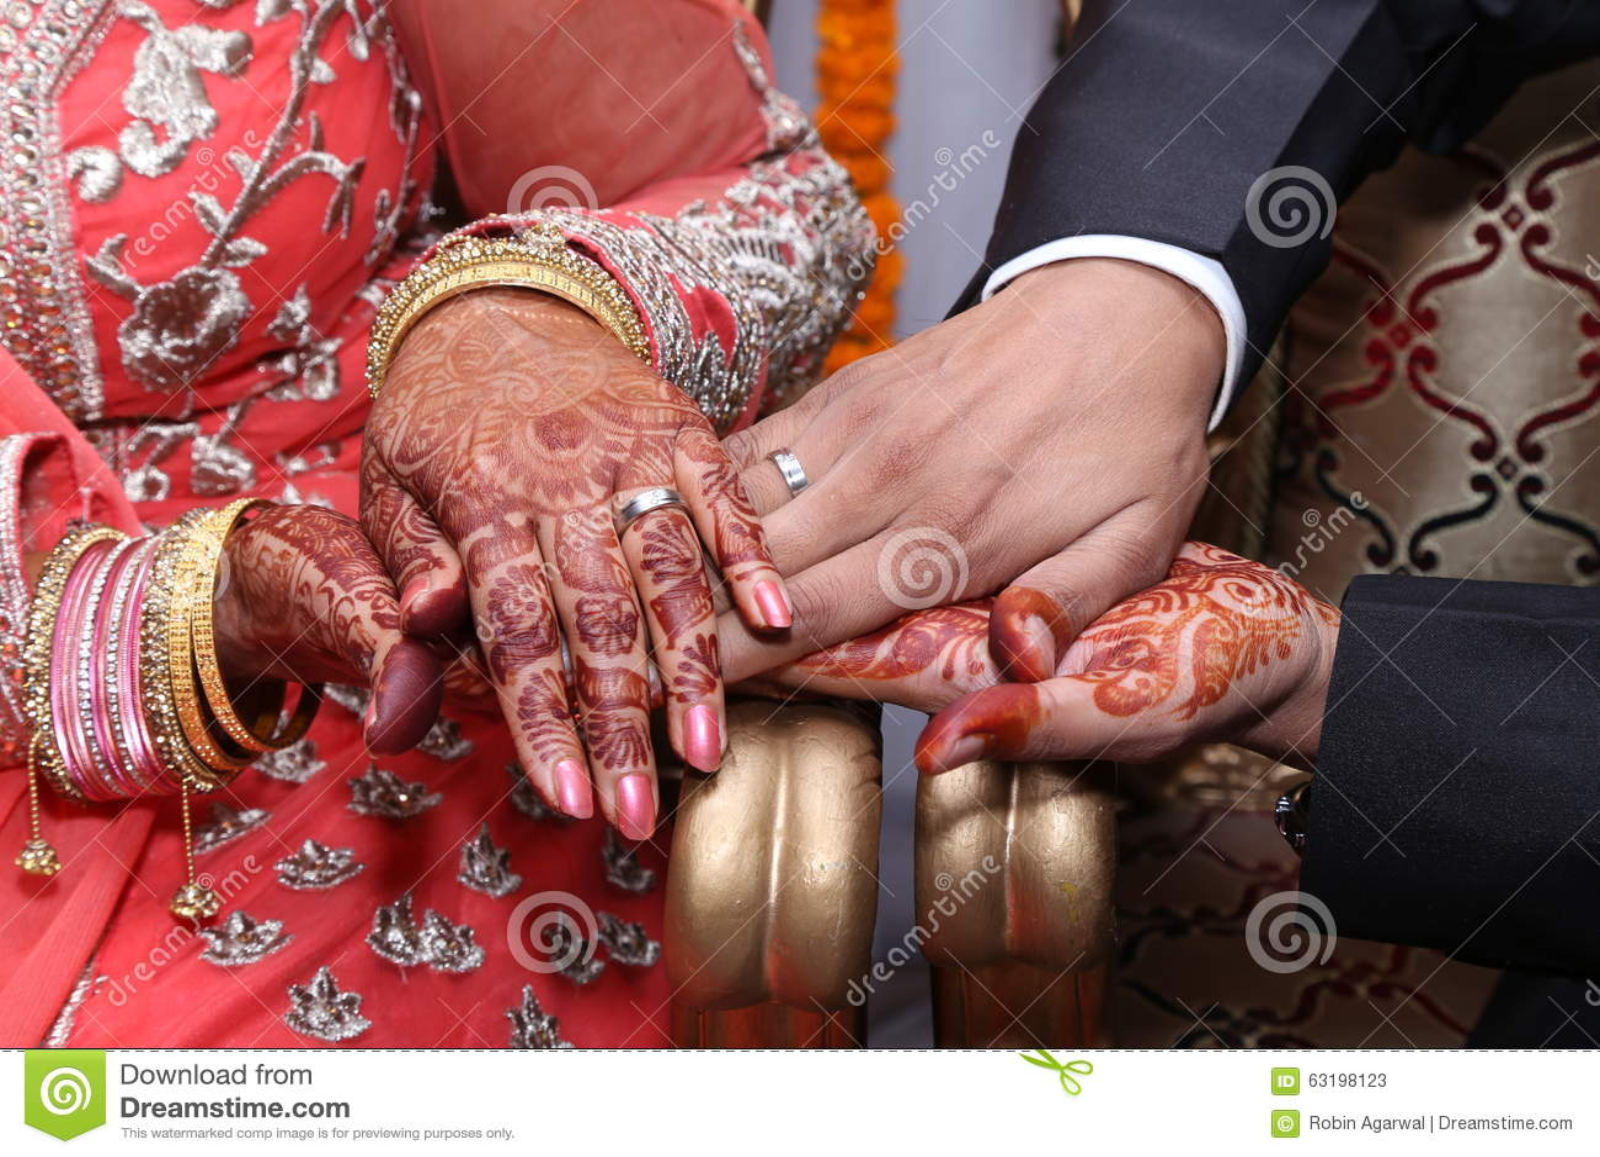 Mehendi Ceremony S Free Download : Hindu wedding ring ceremony stock image of couple